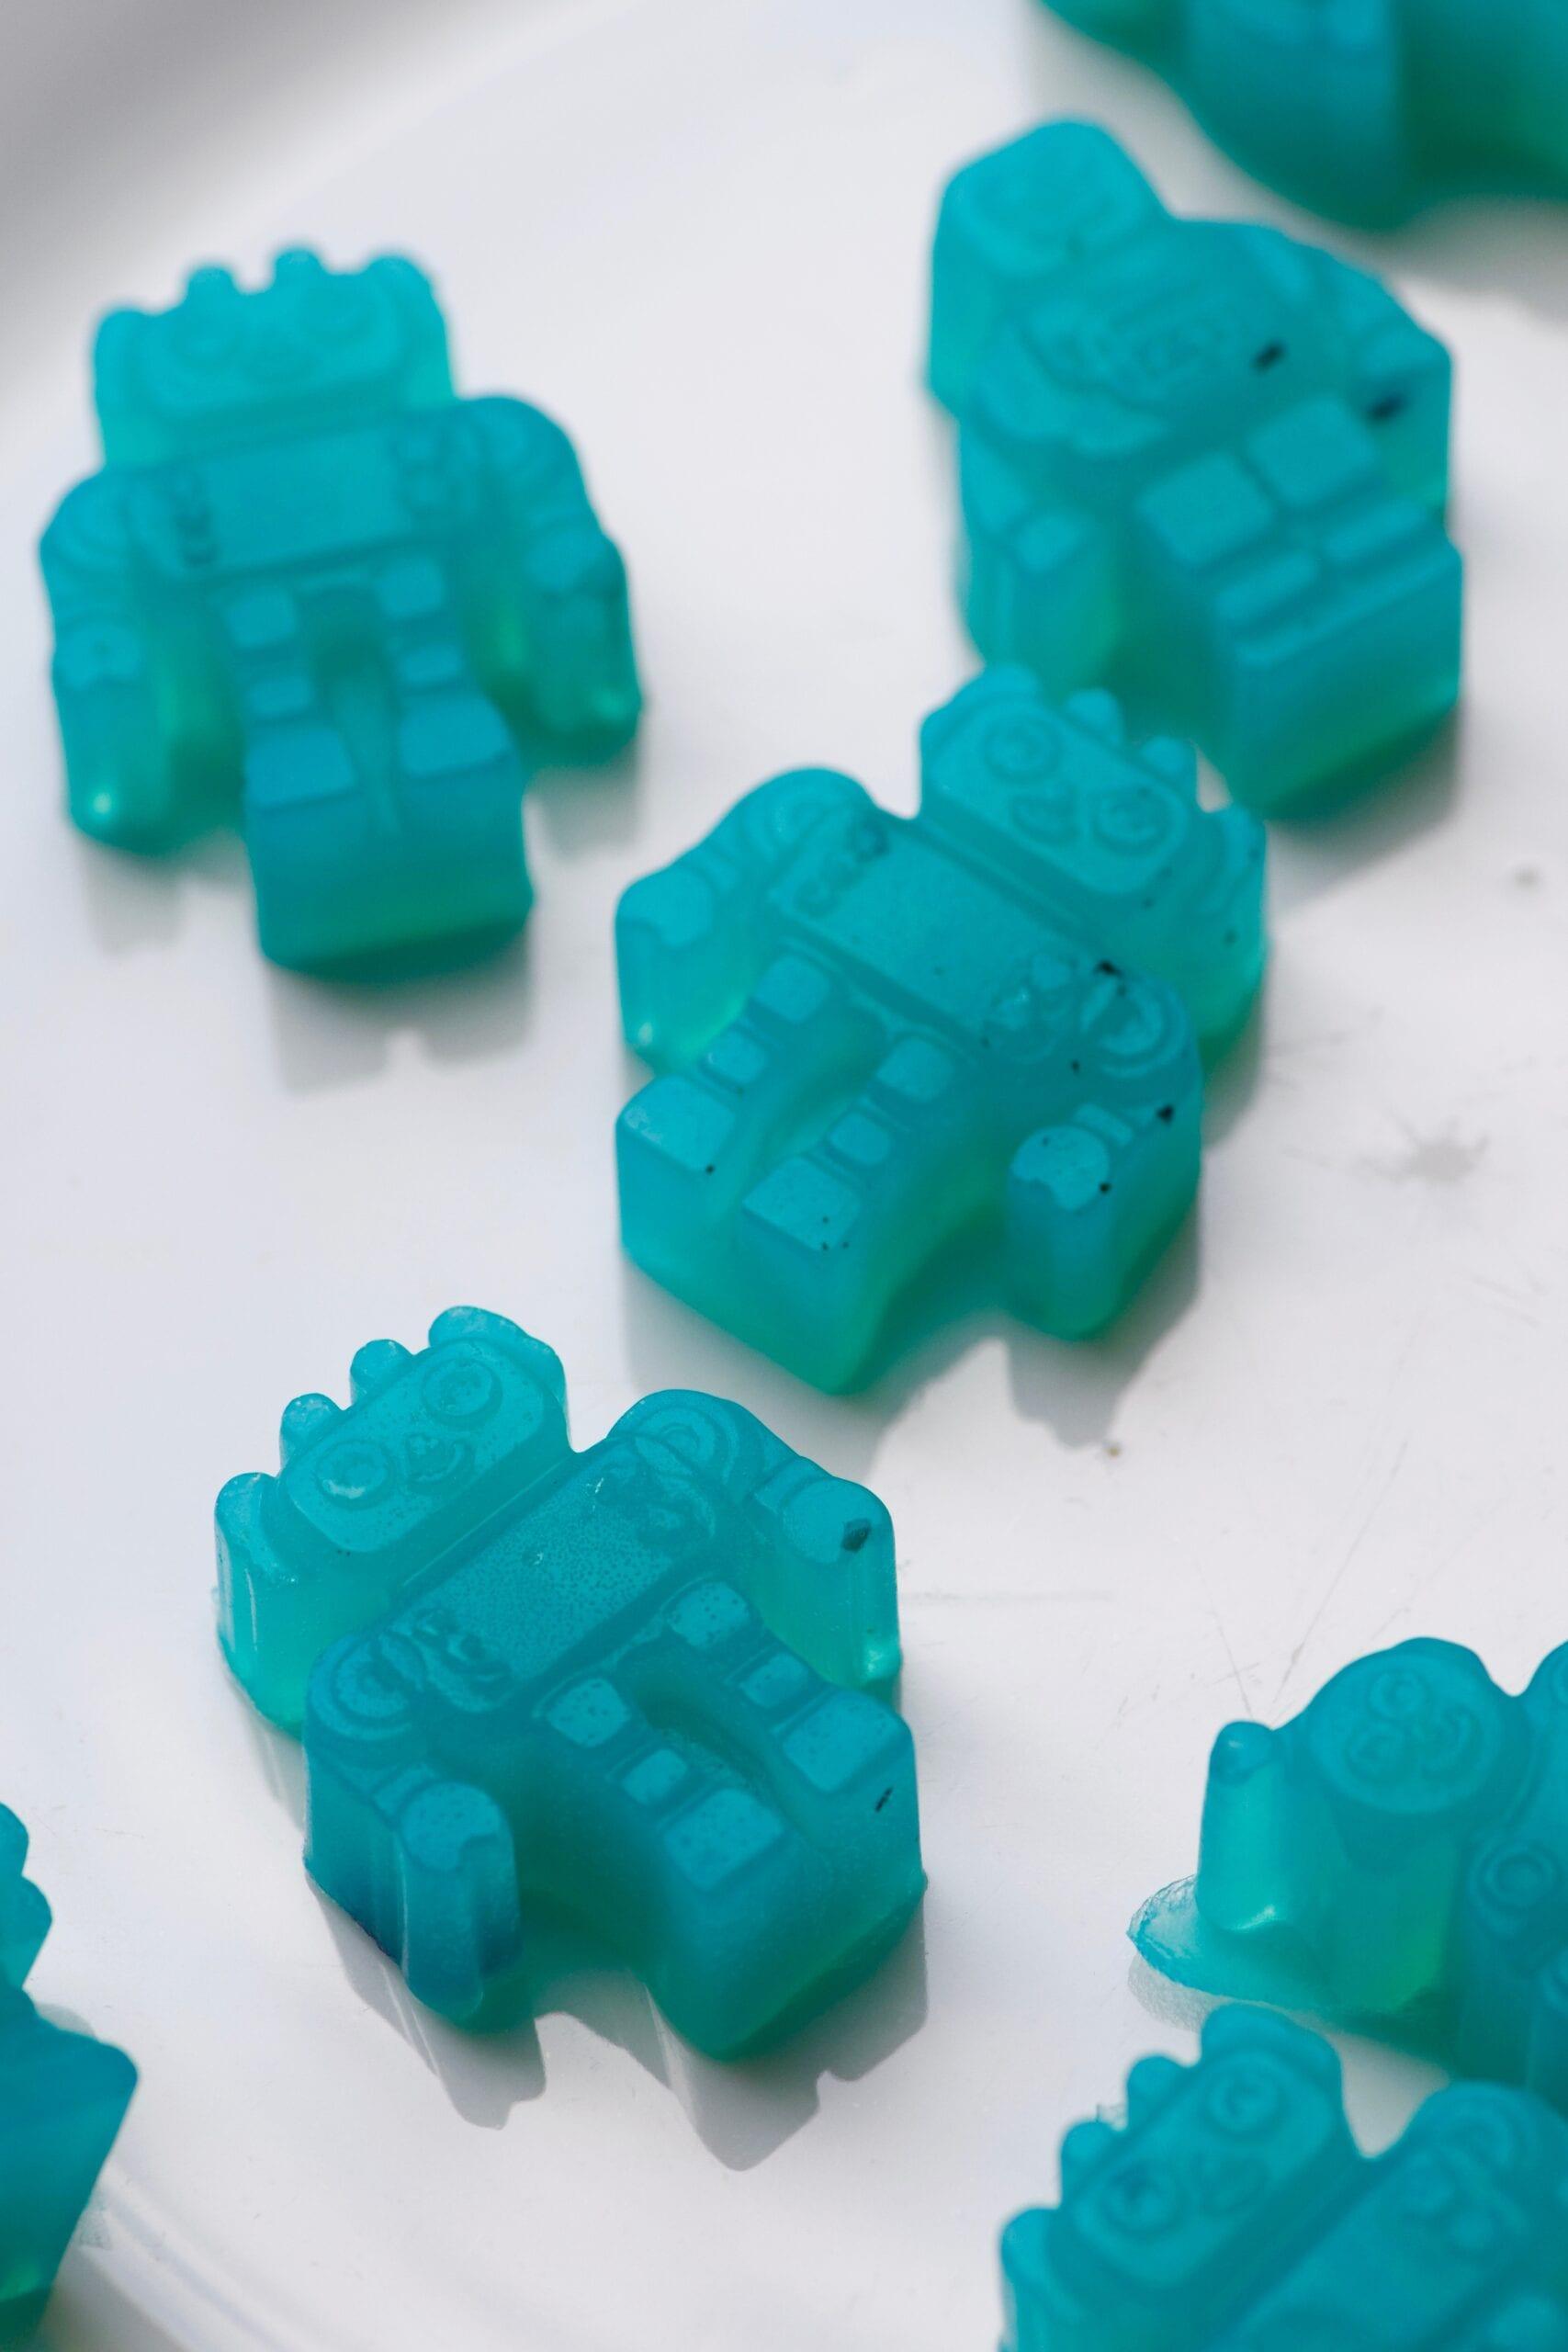 Blueberry vegan gummies in robot shapes